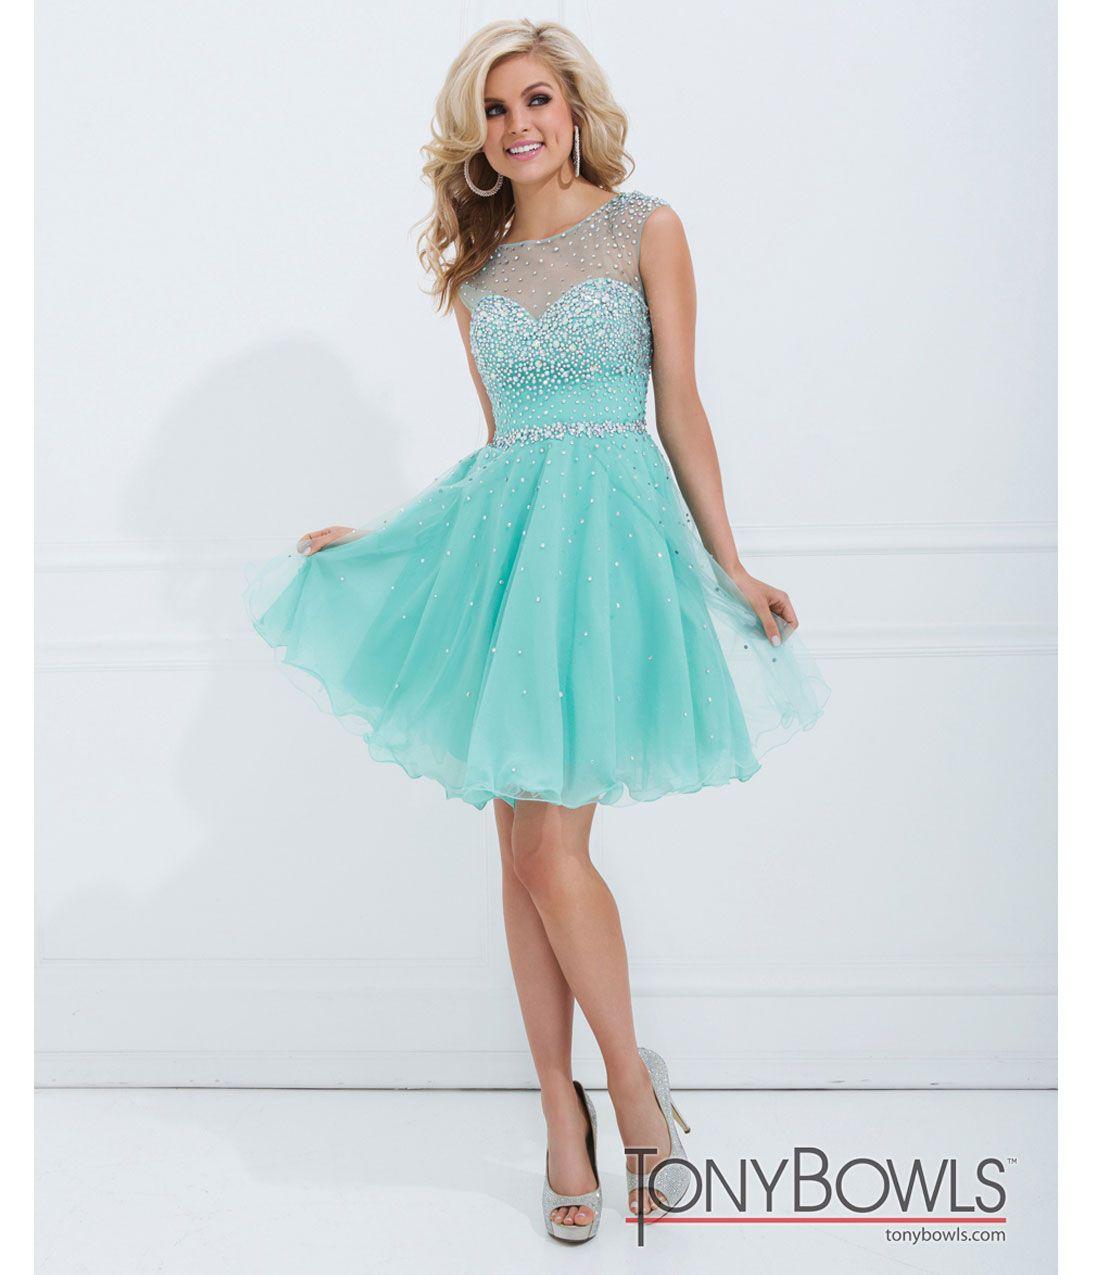 Aqua Homecoming Dresses Photo Album - The Fashions Of Paradise